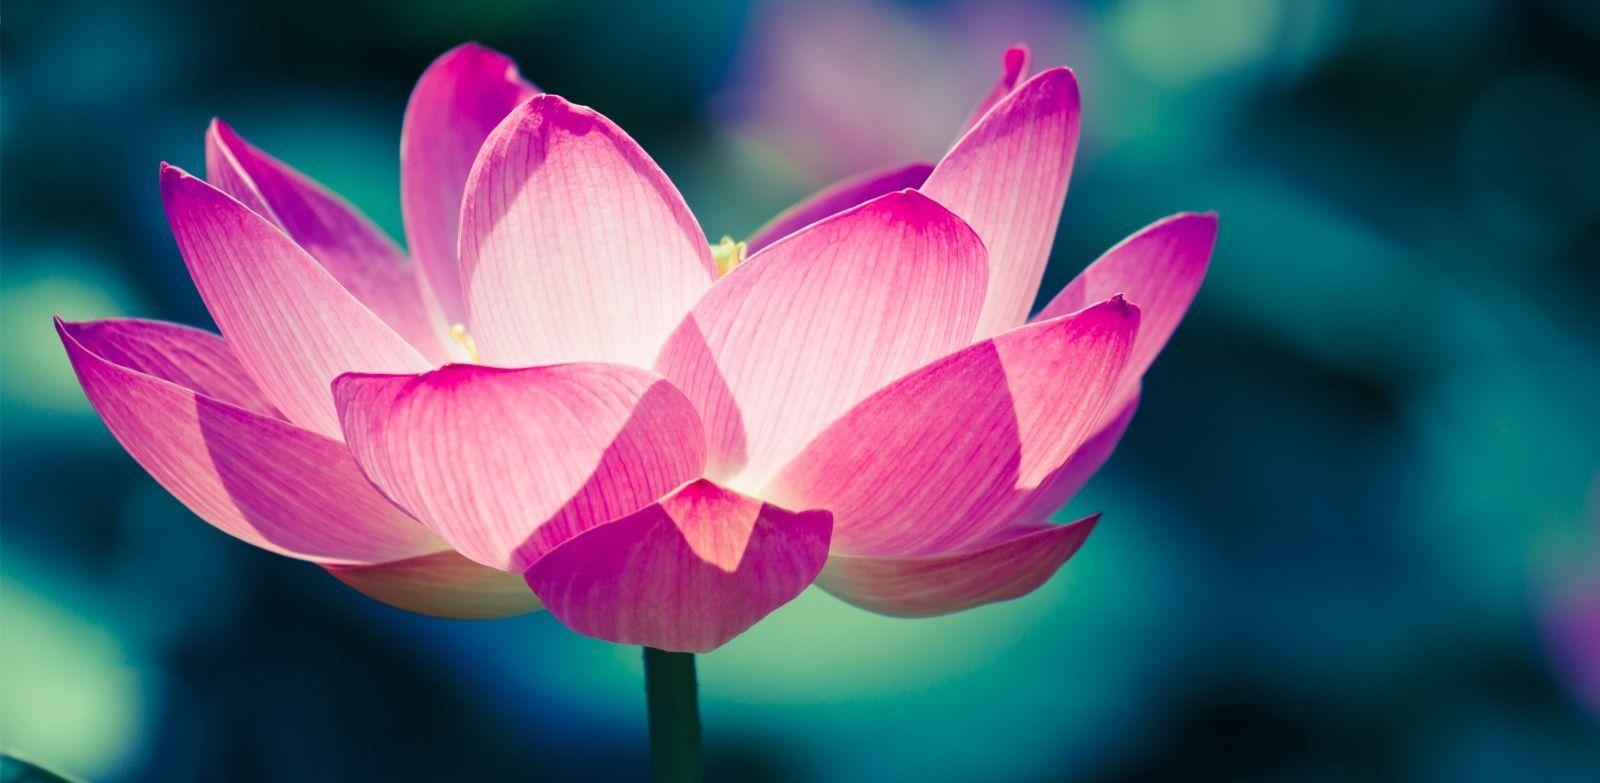 The secret meaning of the lotus flower lotus flower the secret meaning of the lotus flower townandcountrymag izmirmasajfo